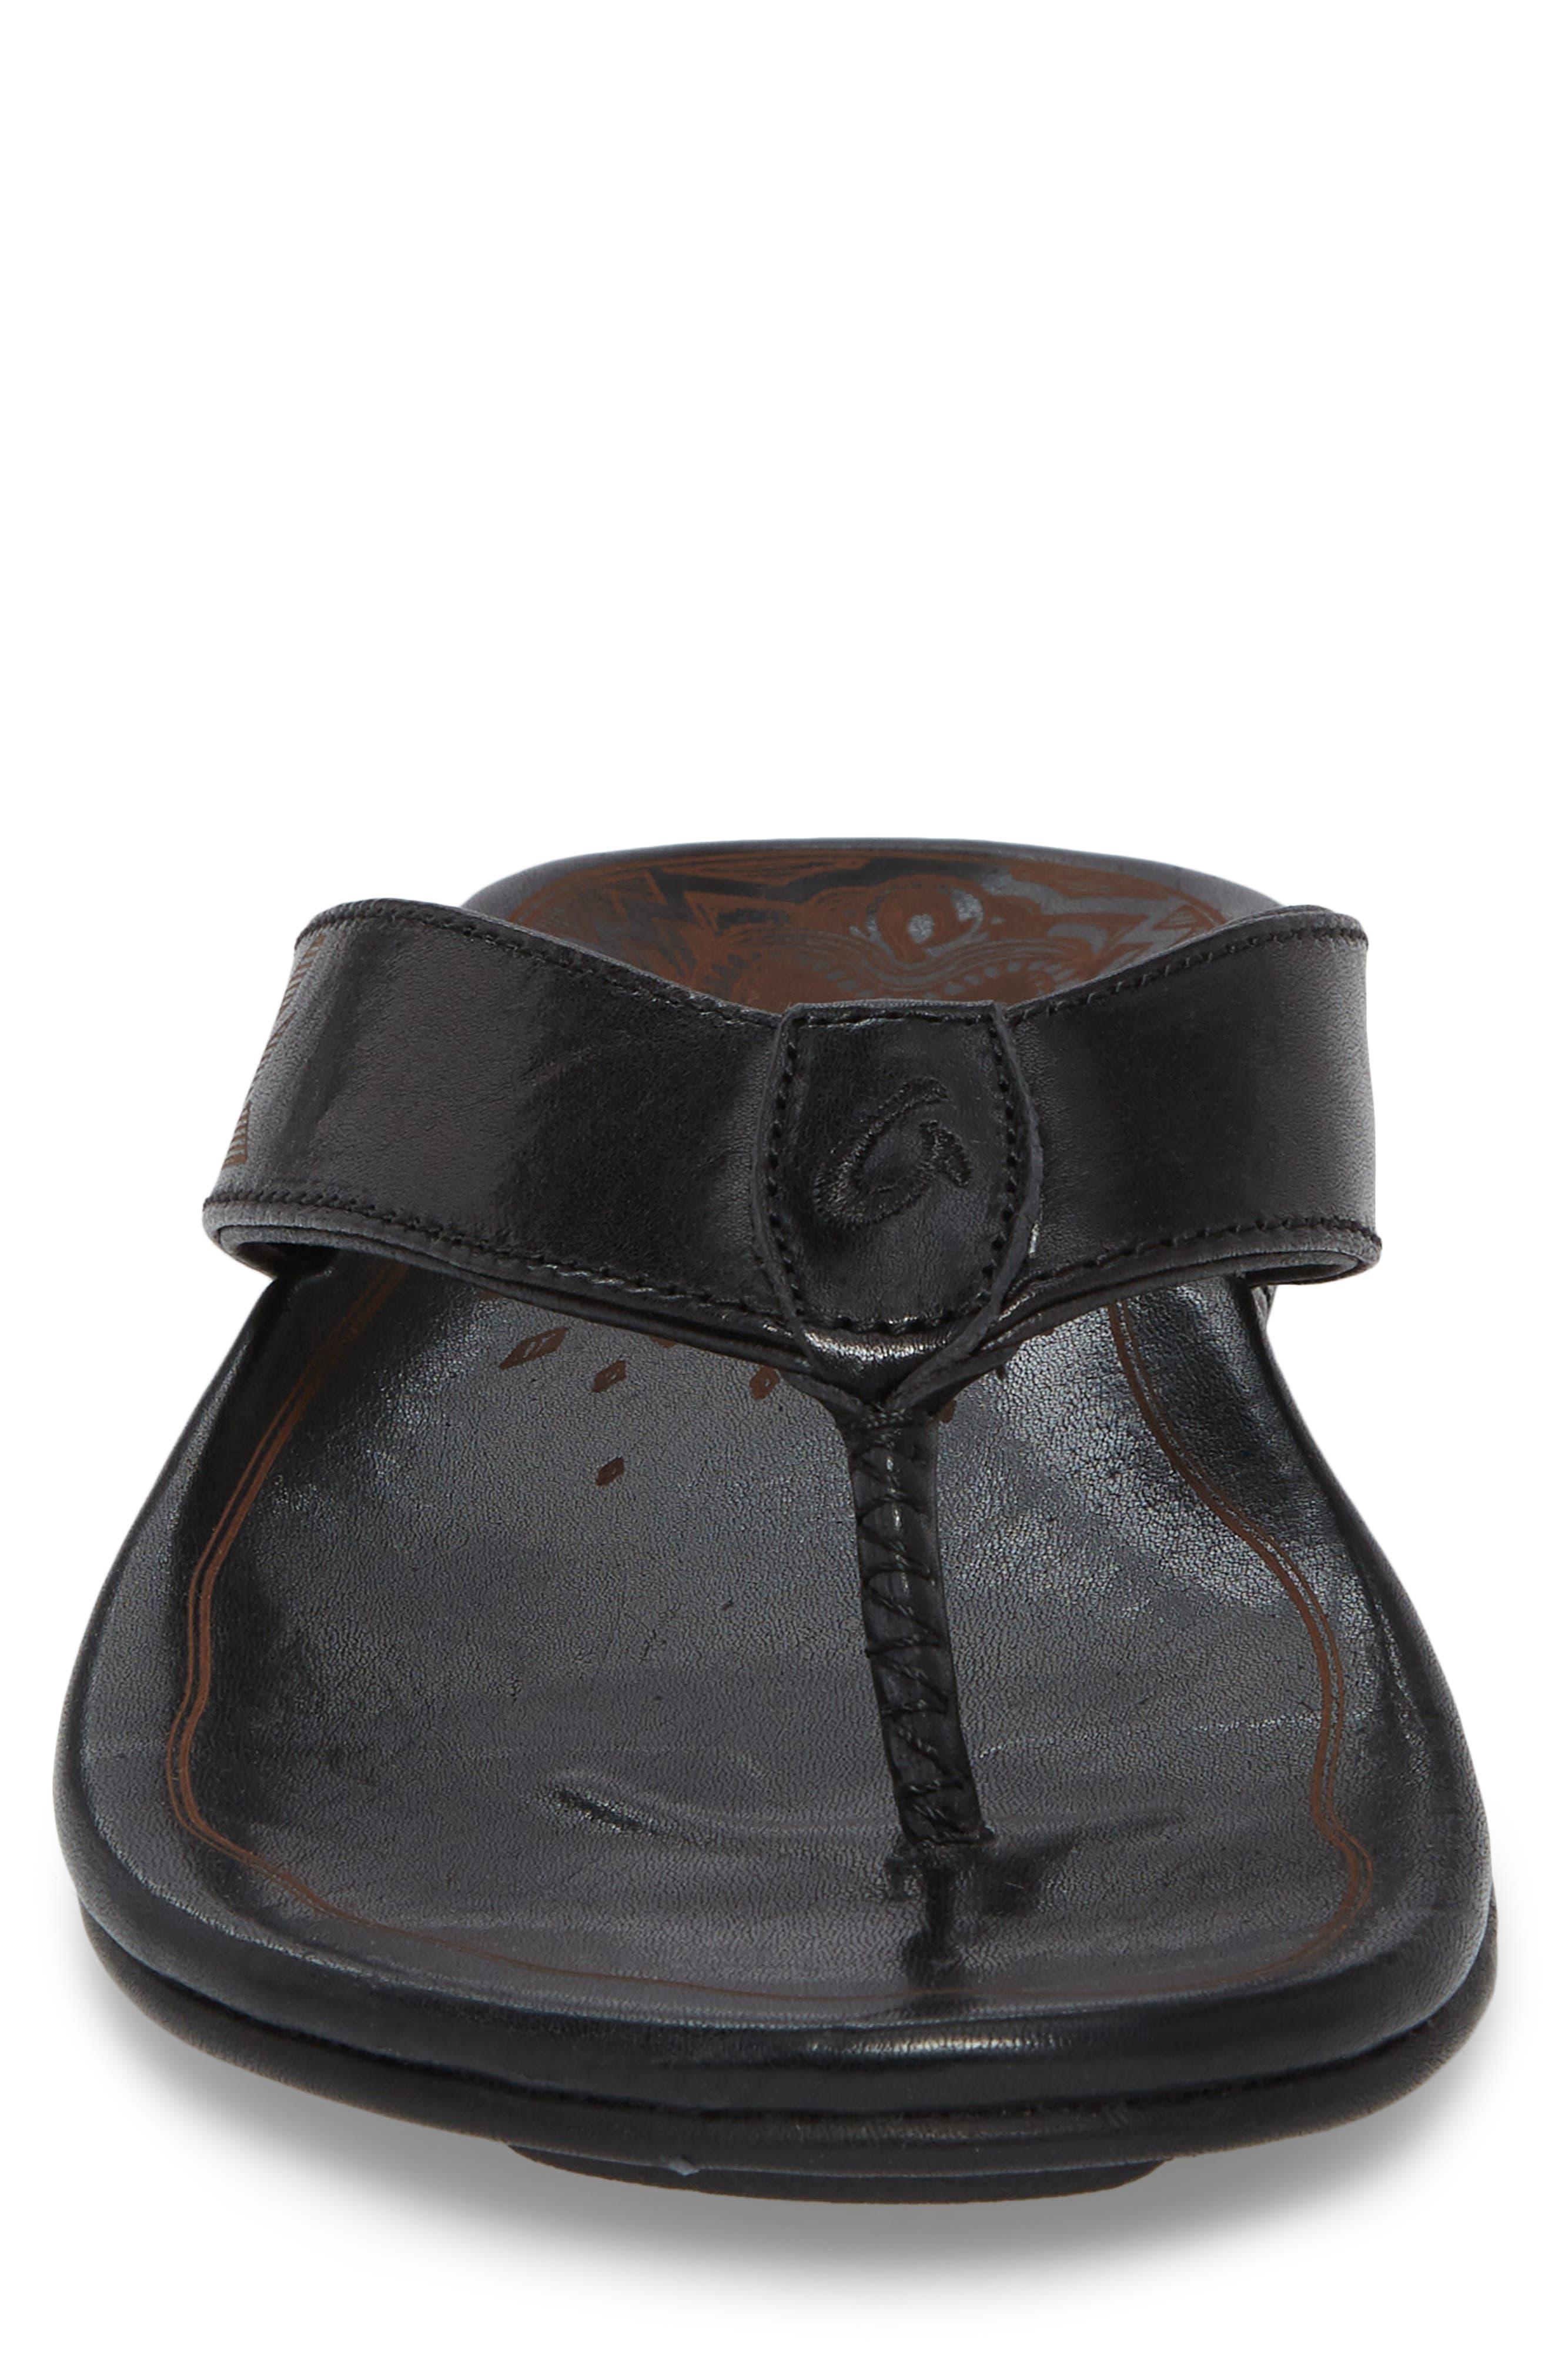 Kulia Flip Flop,                             Alternate thumbnail 4, color,                             Black/ Black Leather